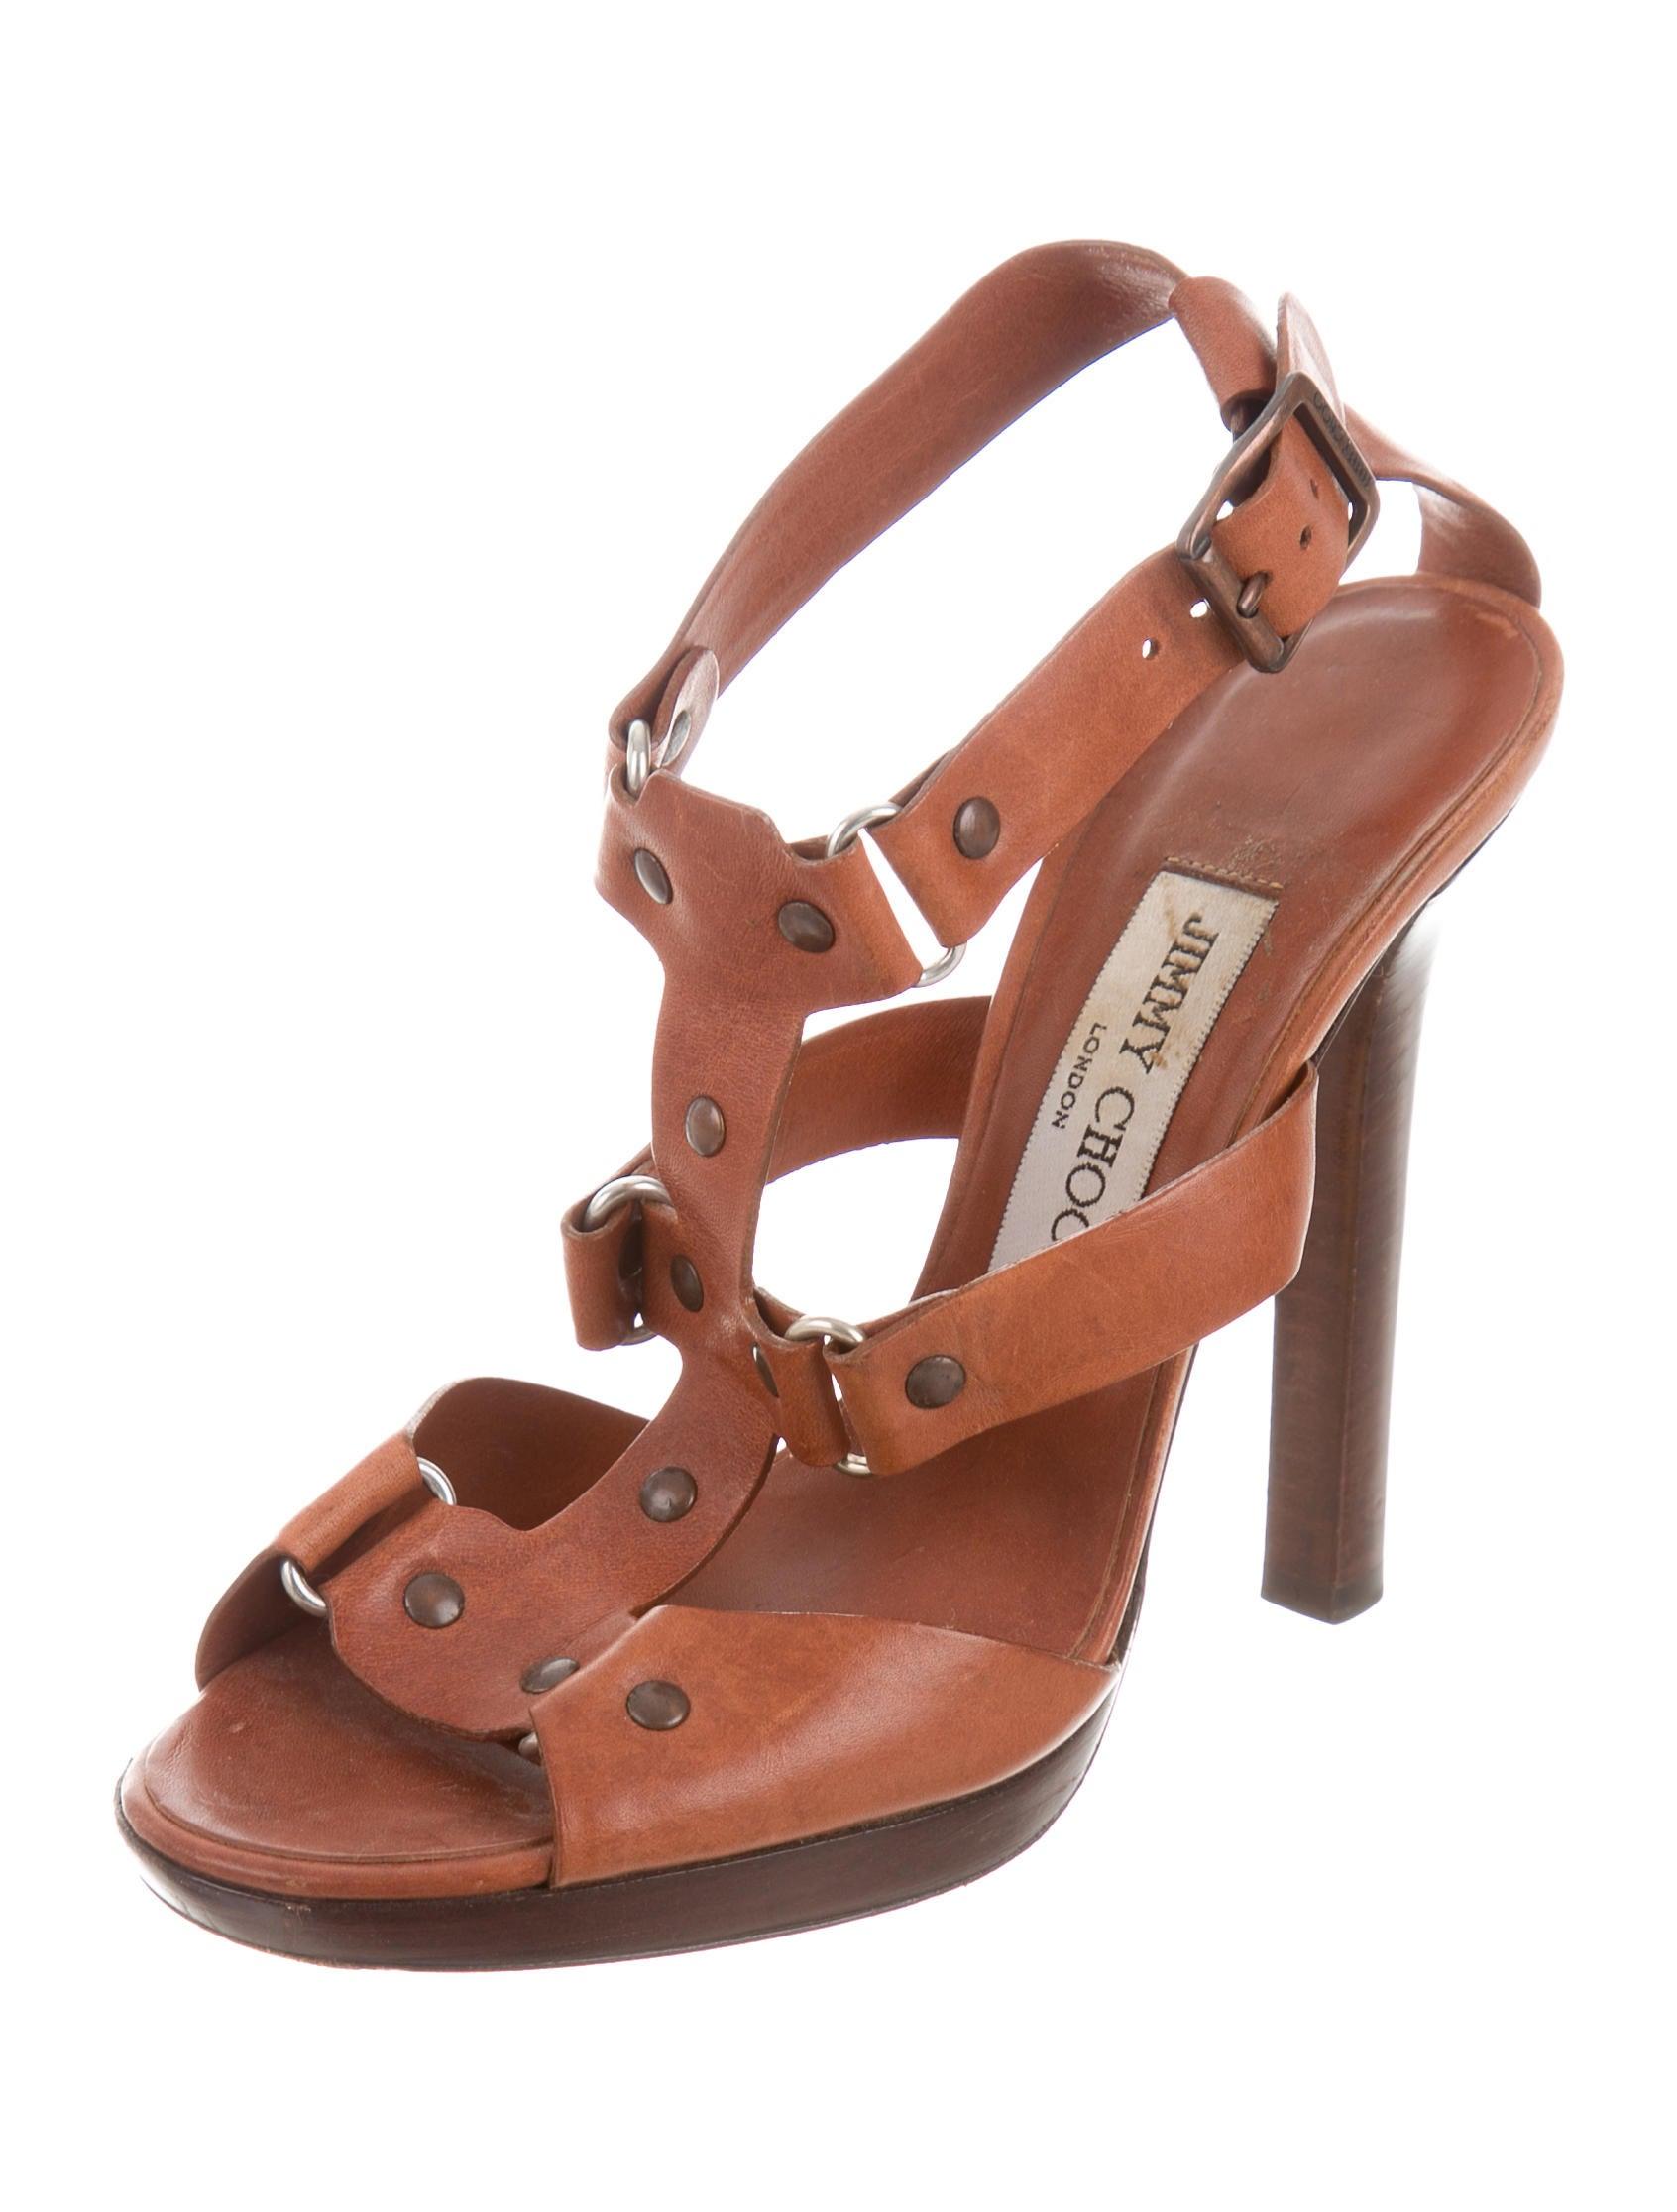 jimmy choo shoes handm